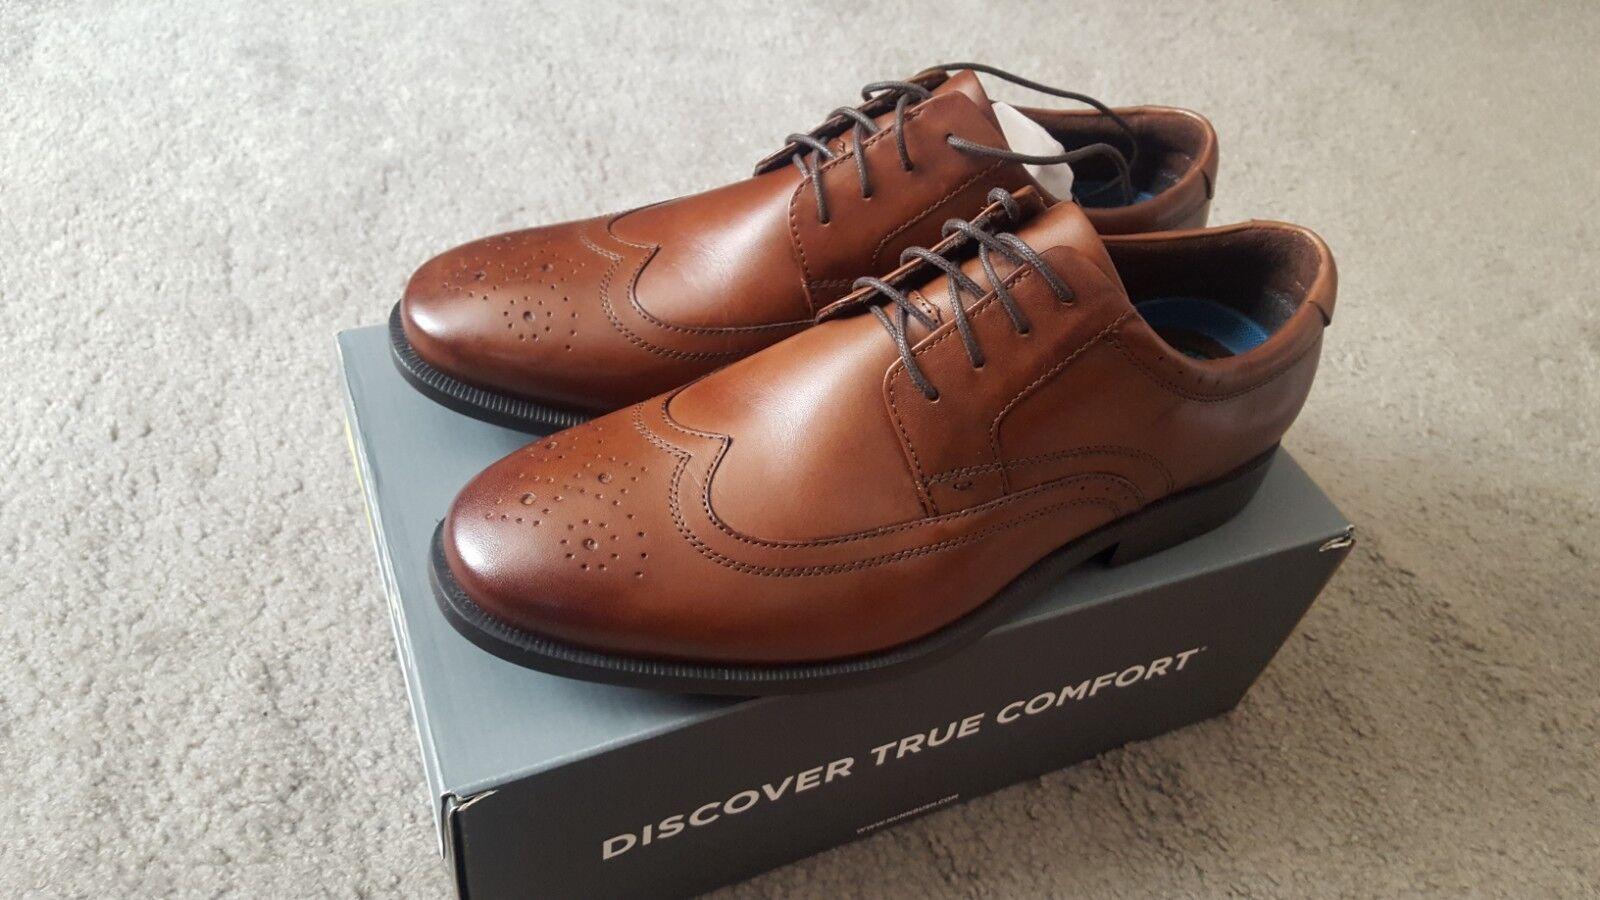 Nunn Bush  Decker  leather comfort dress dress dress schuhe - braun 10.5 W 4ec7b4